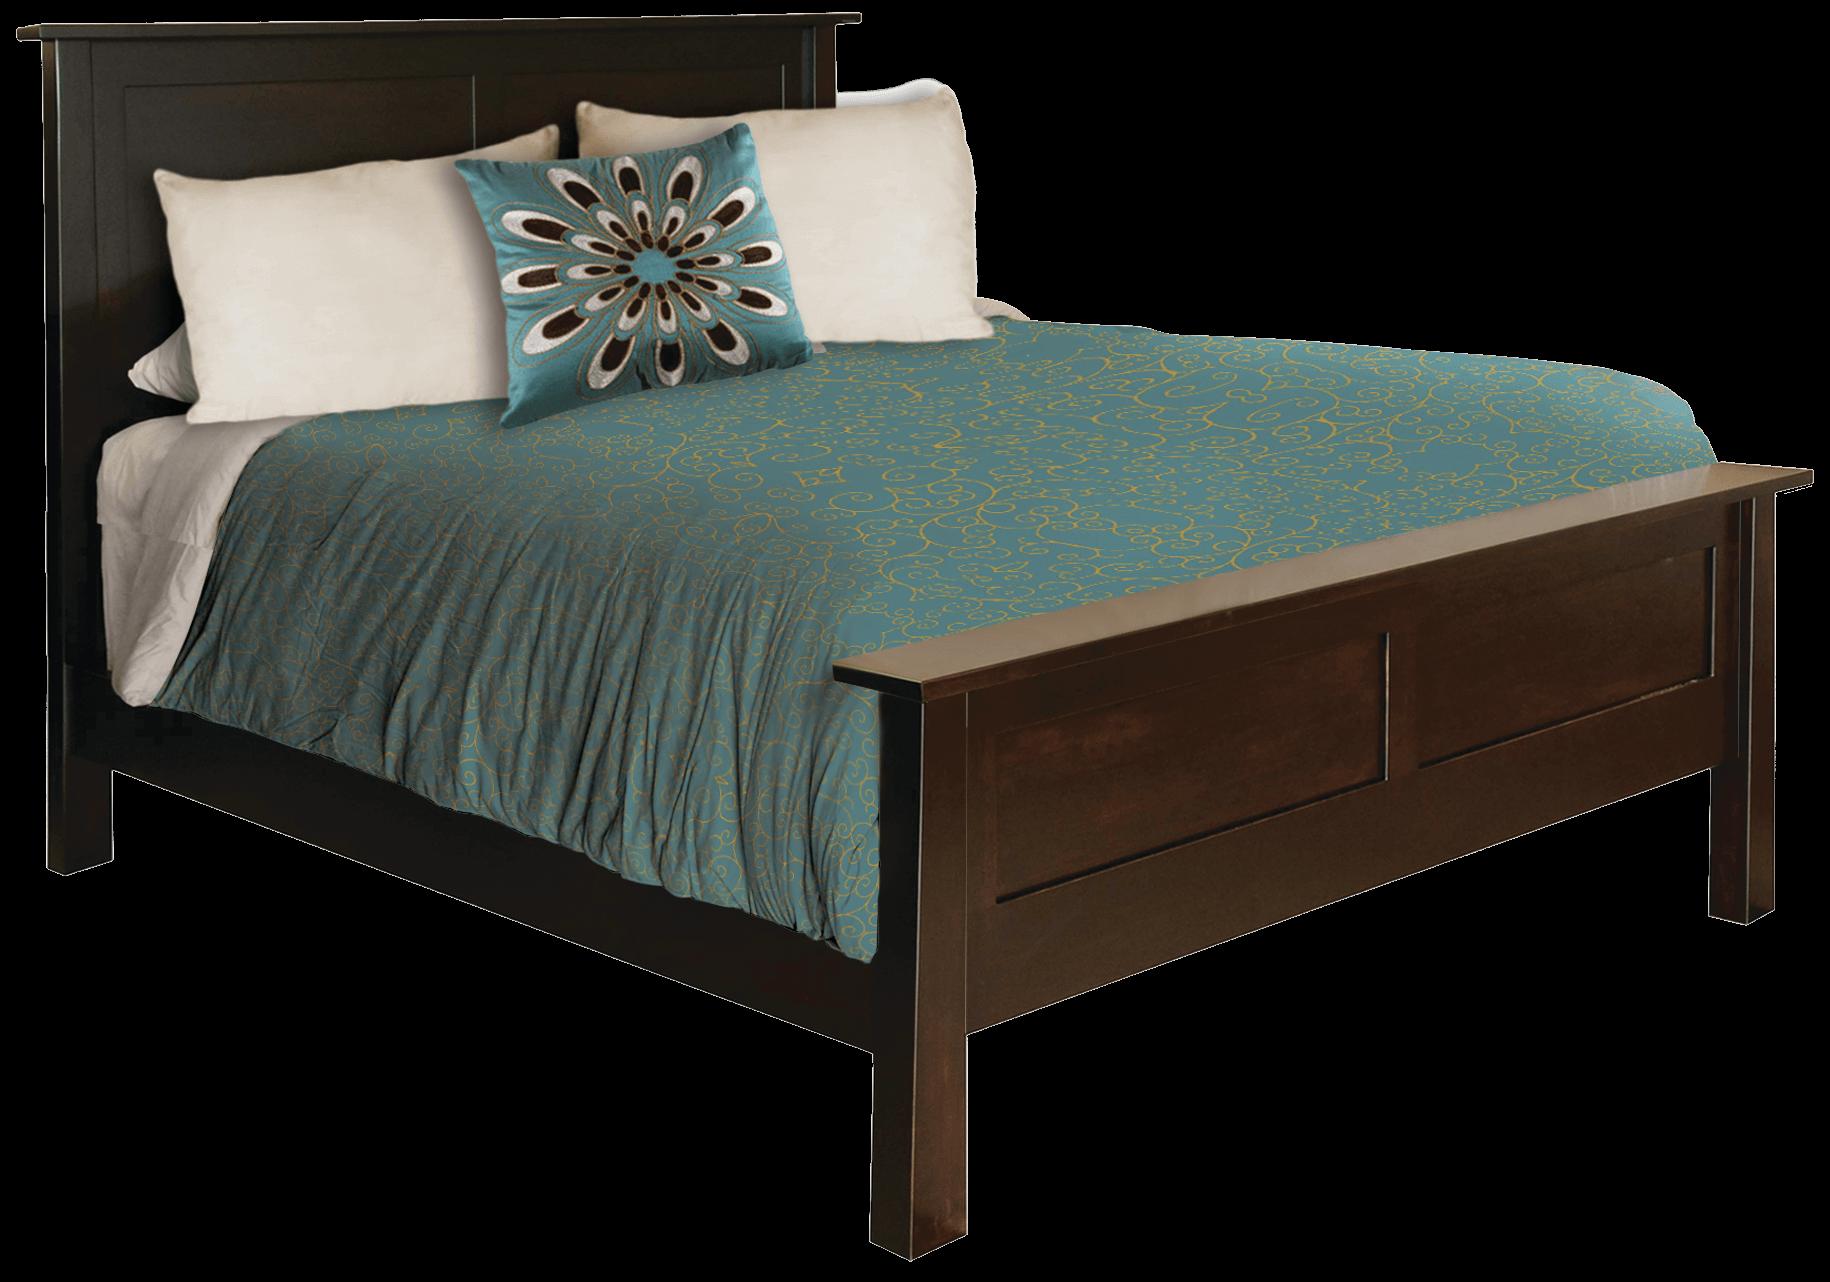 HD Bed Transparent Furniture.